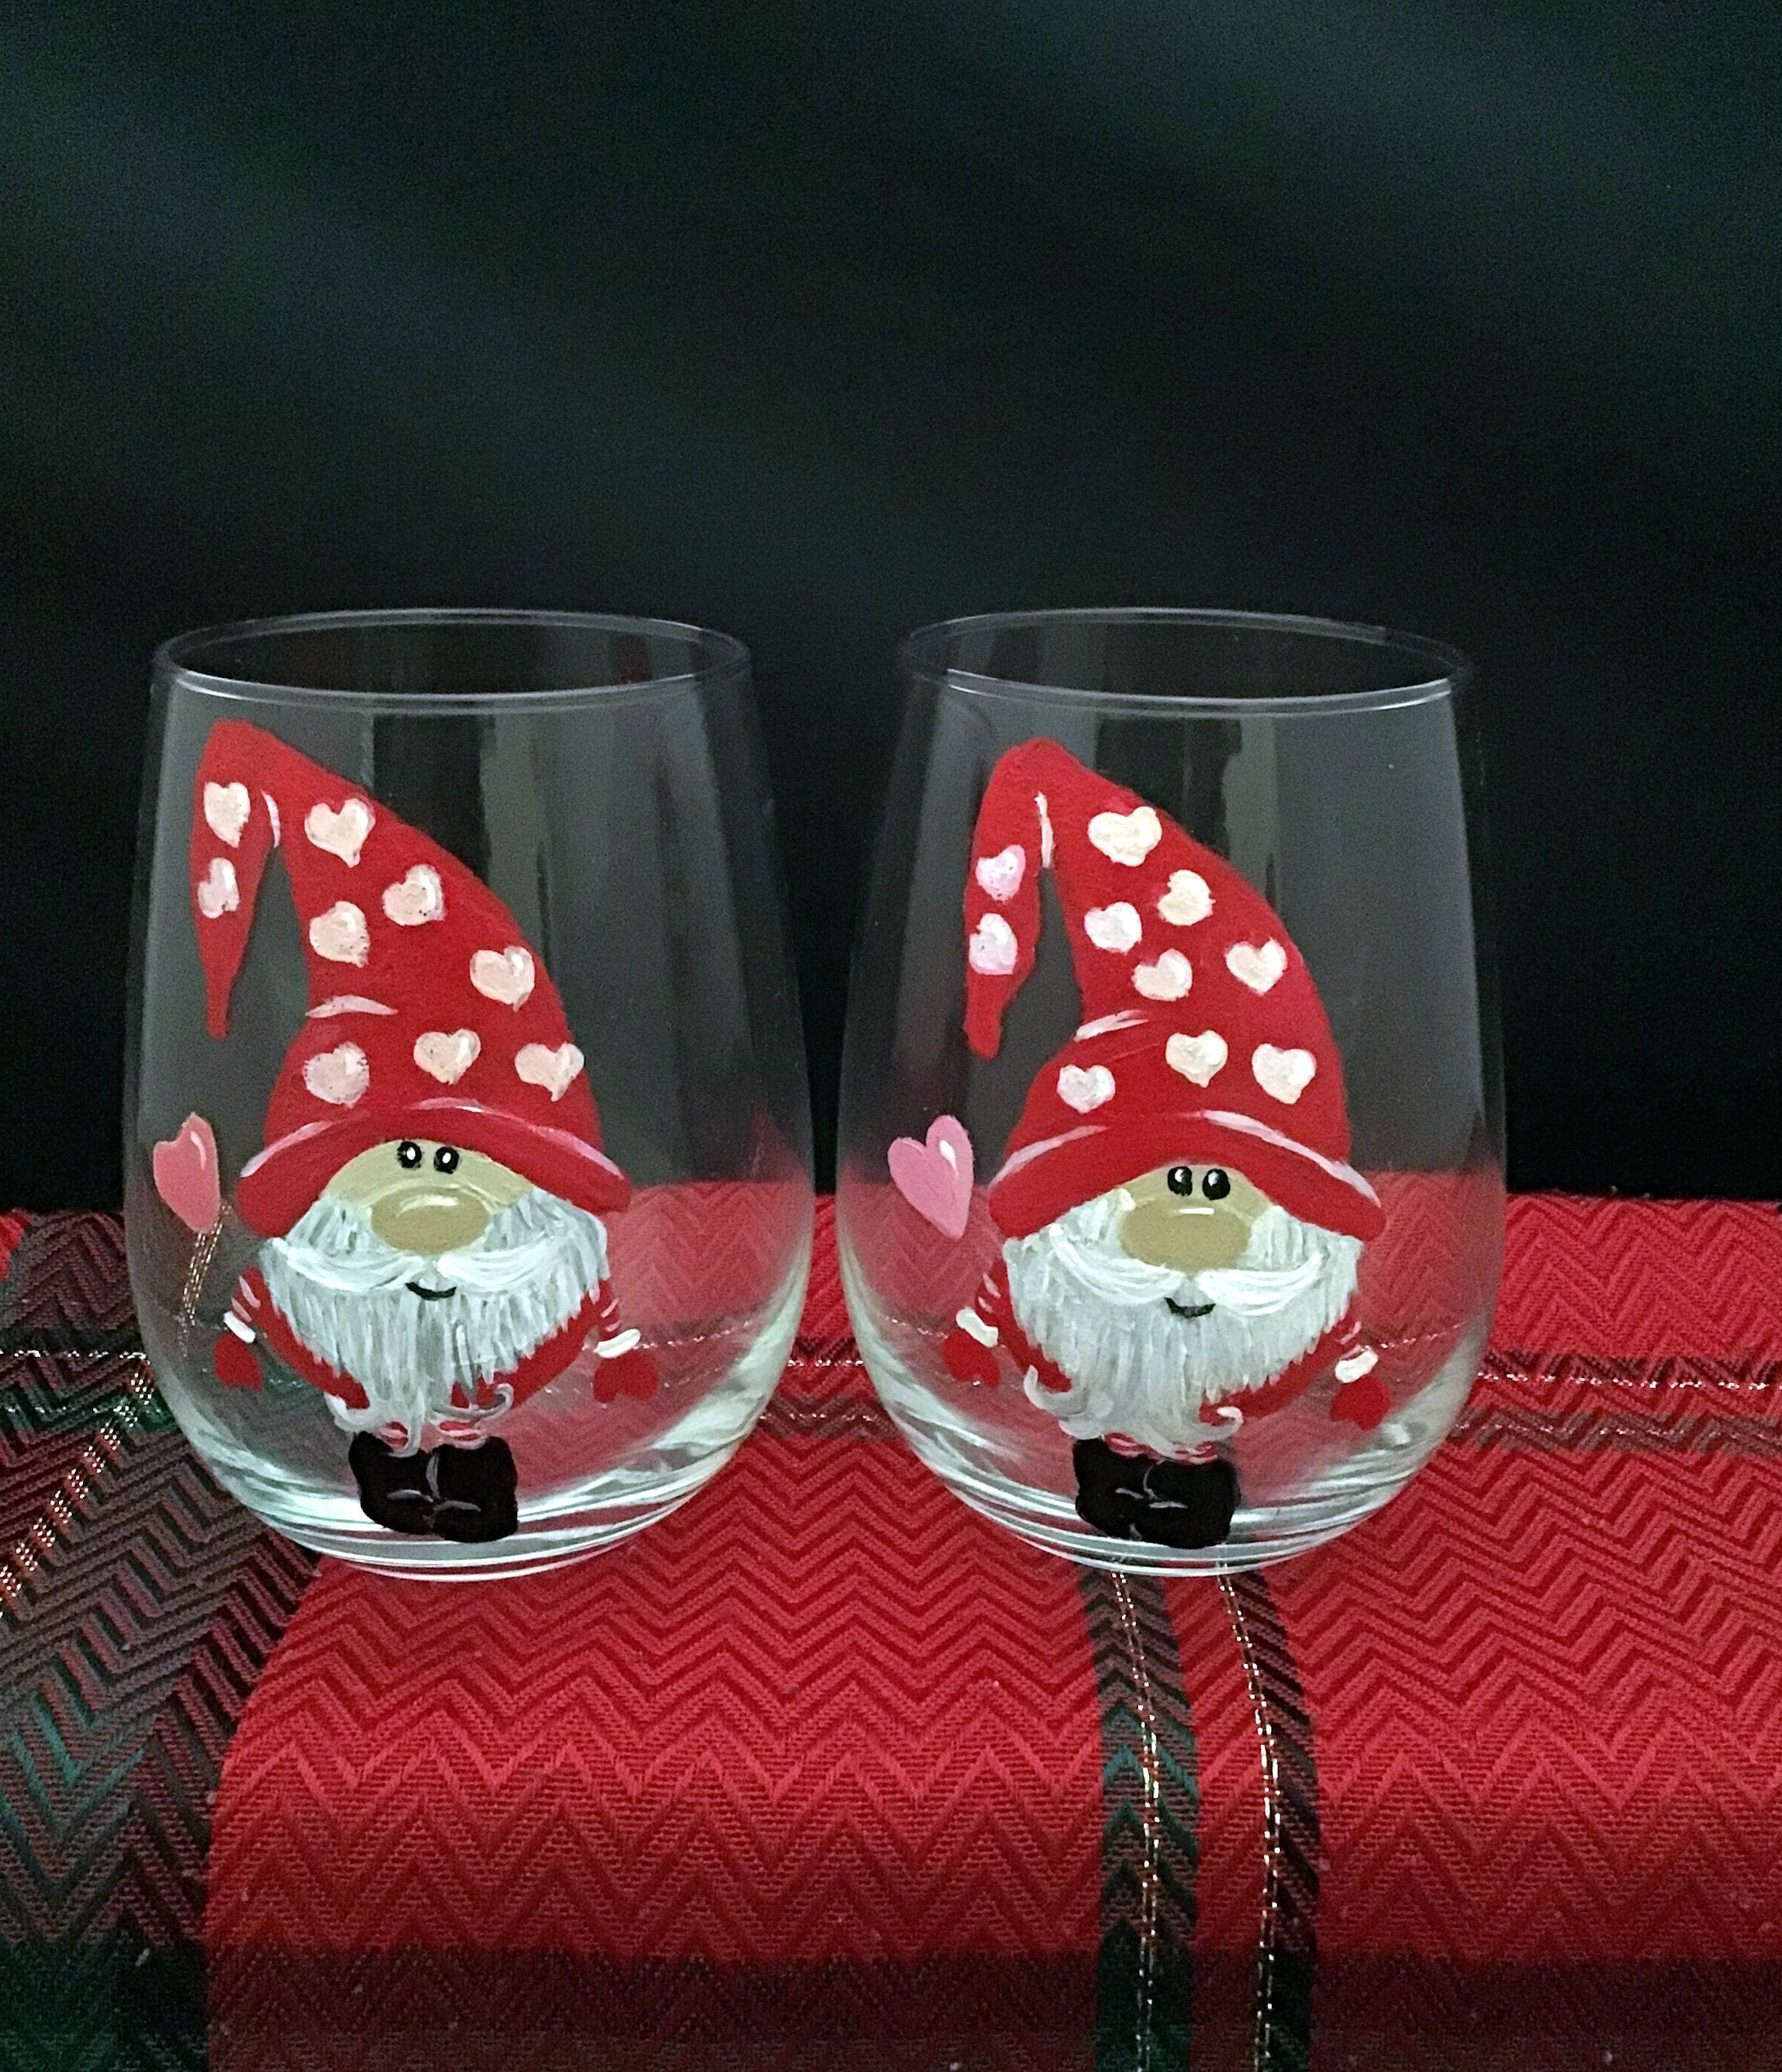 Gnome Wine Glass Heart Gnomes Christmas Gnomes Glasses Etsy In 2020 Painted Wine Glasses Christmas Wine Glass Decor Winter Wine Glasses